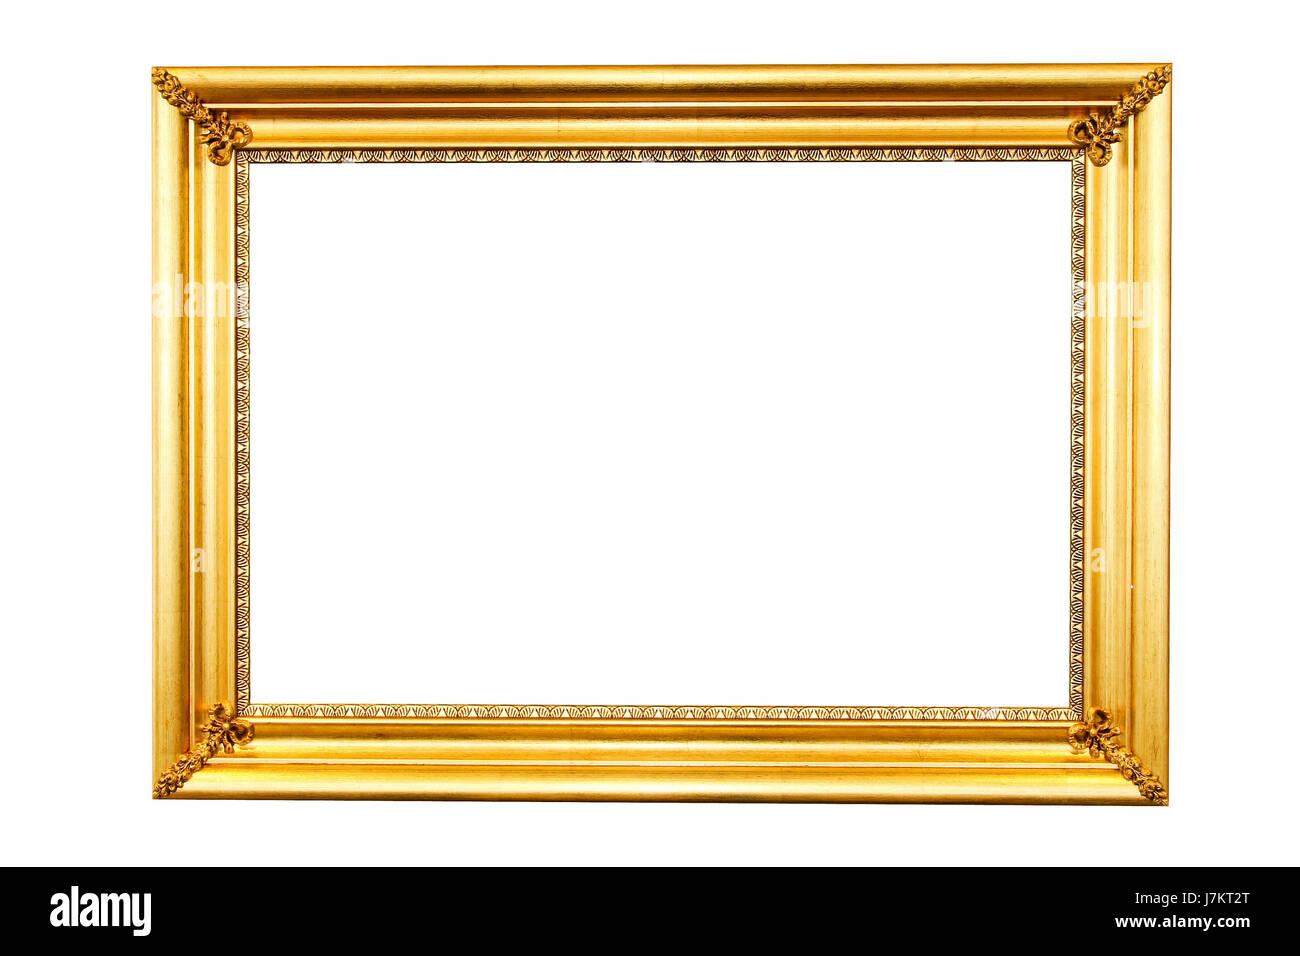 Marco dorado marco de oro aislado border art fotos vintage antiguos ...